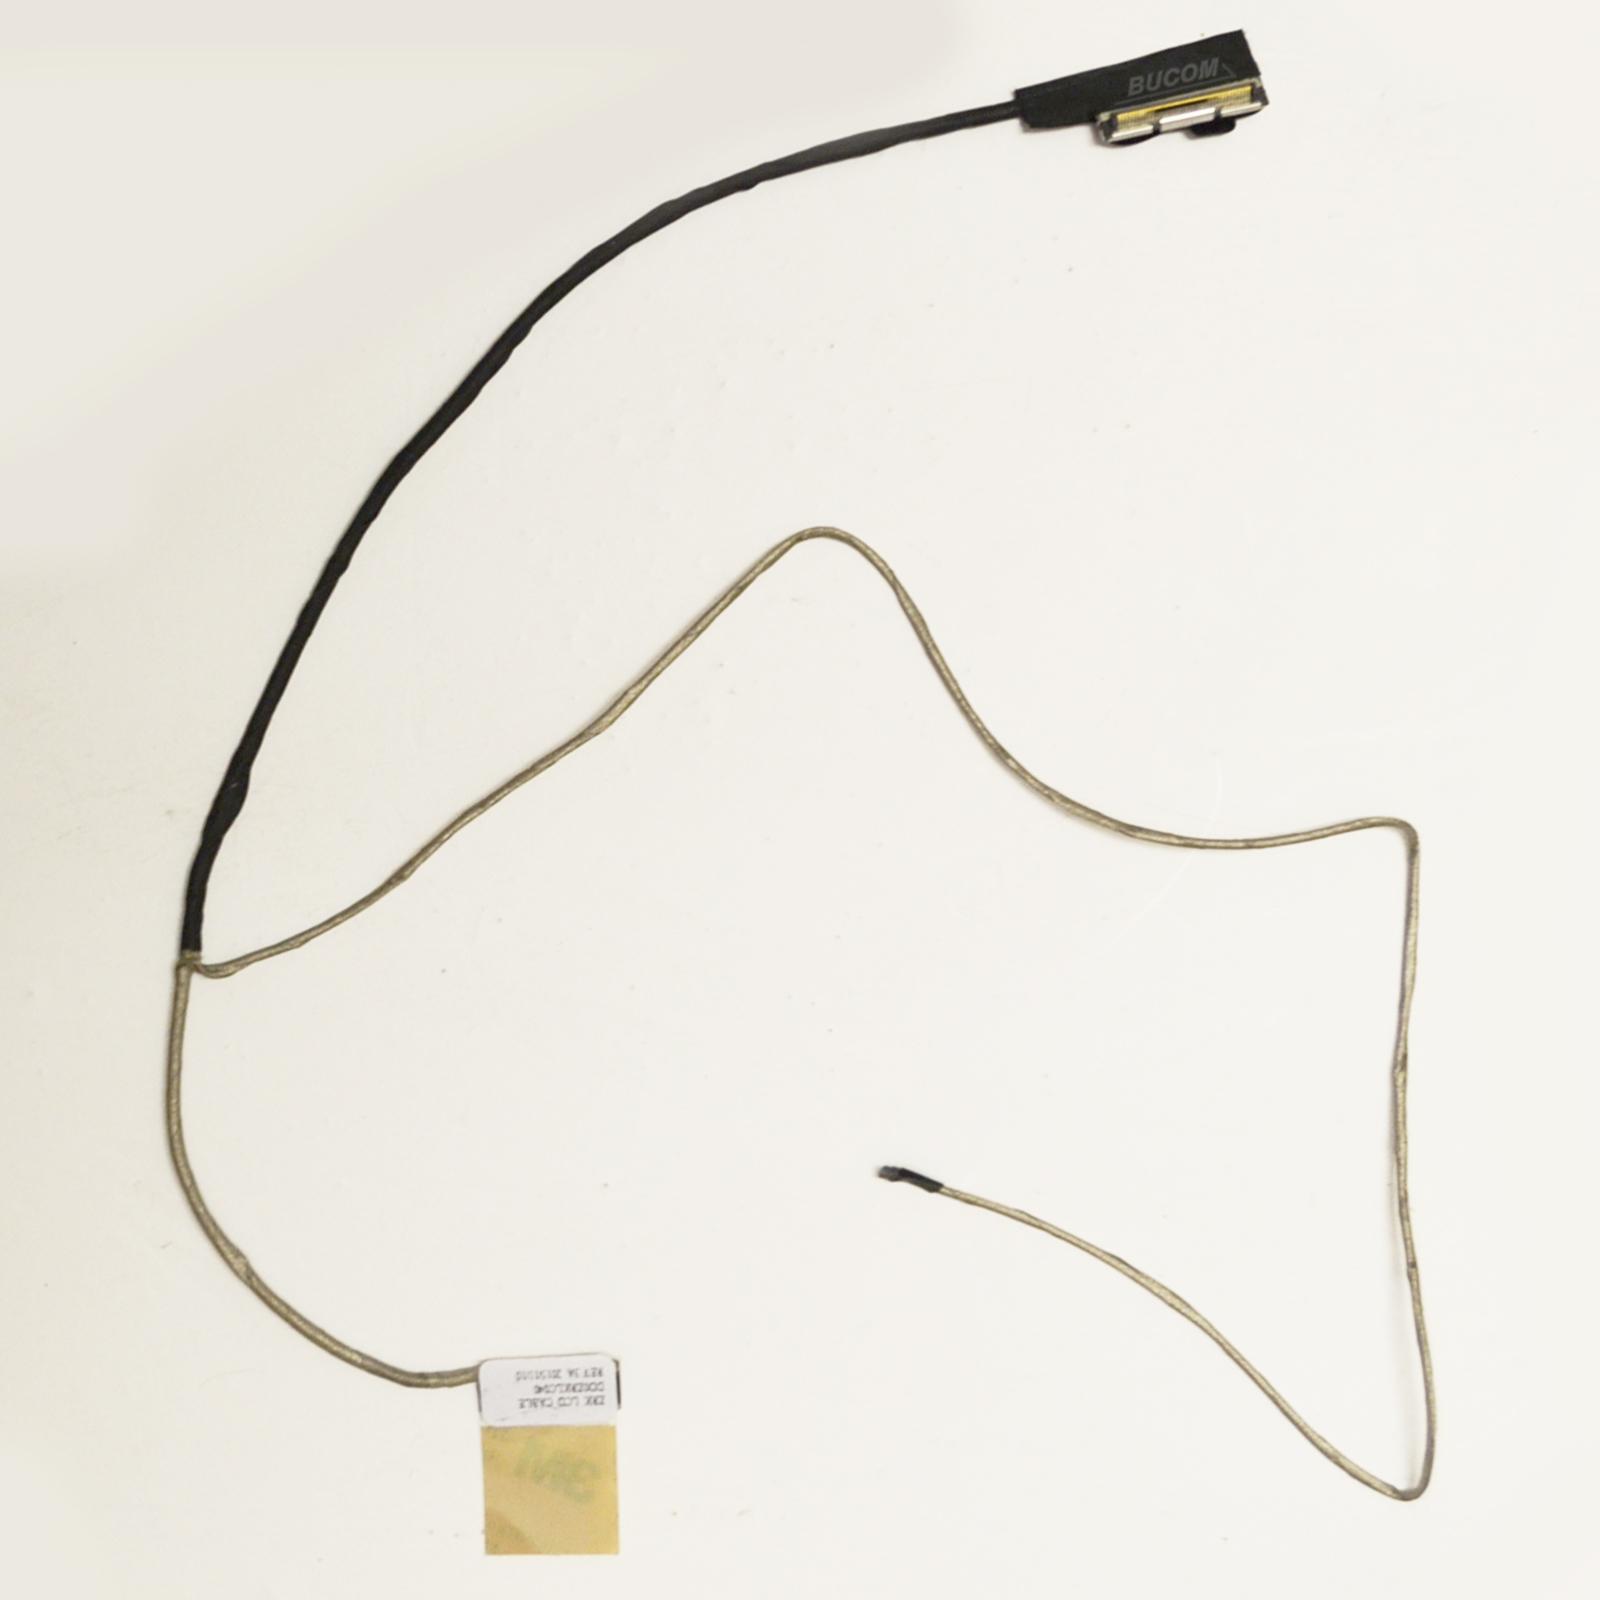 PC-LAPTOP-CENTER.COM - Display LCD Video Kabel für Acer ... on